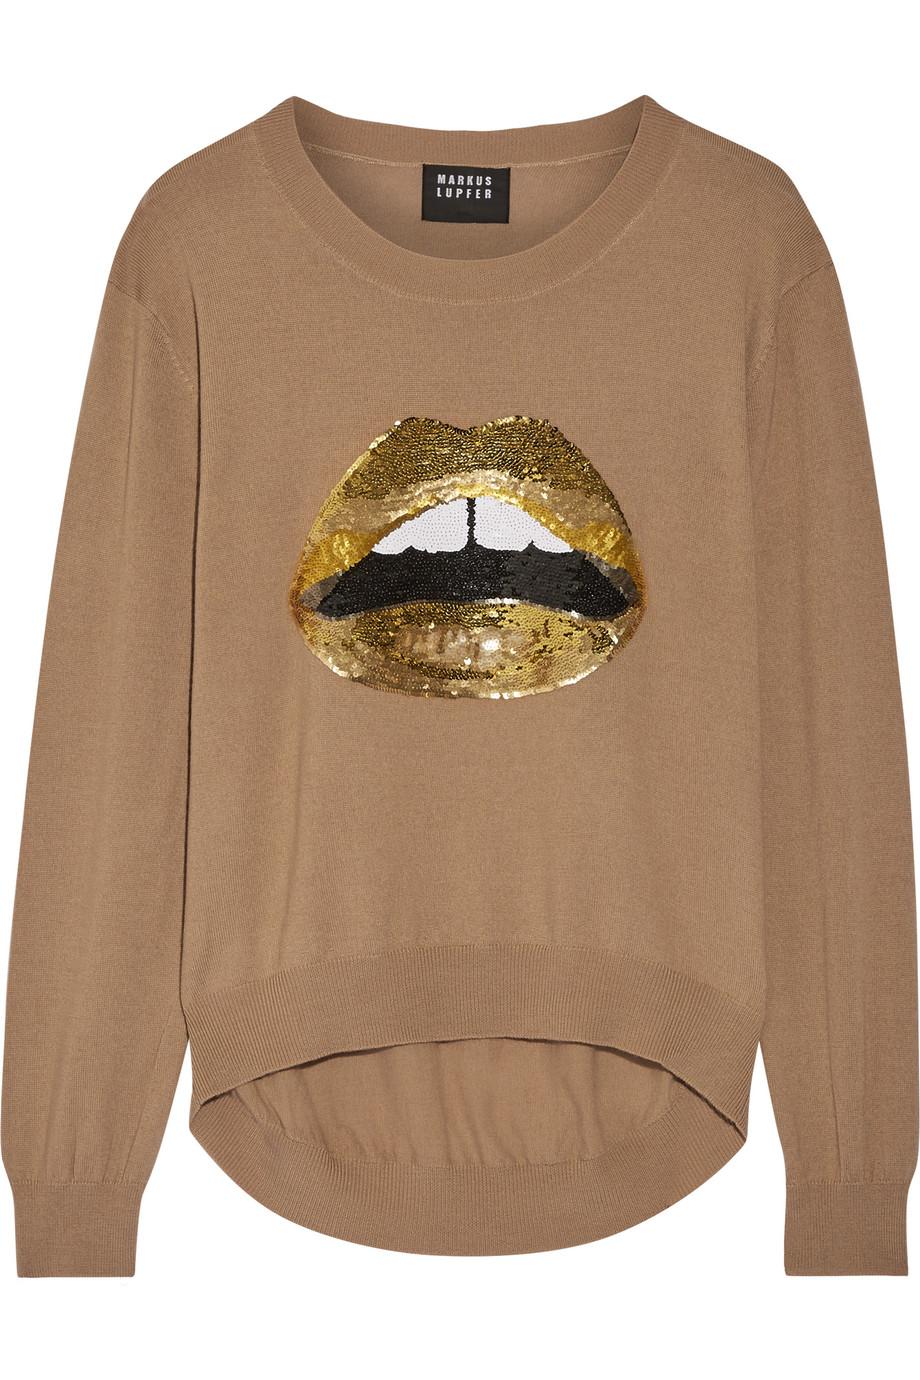 Markus Lupfer Lara Lip Joey Sequin-Embellished Merino Wool Sweater, Mushroom, Women's, Size: XS